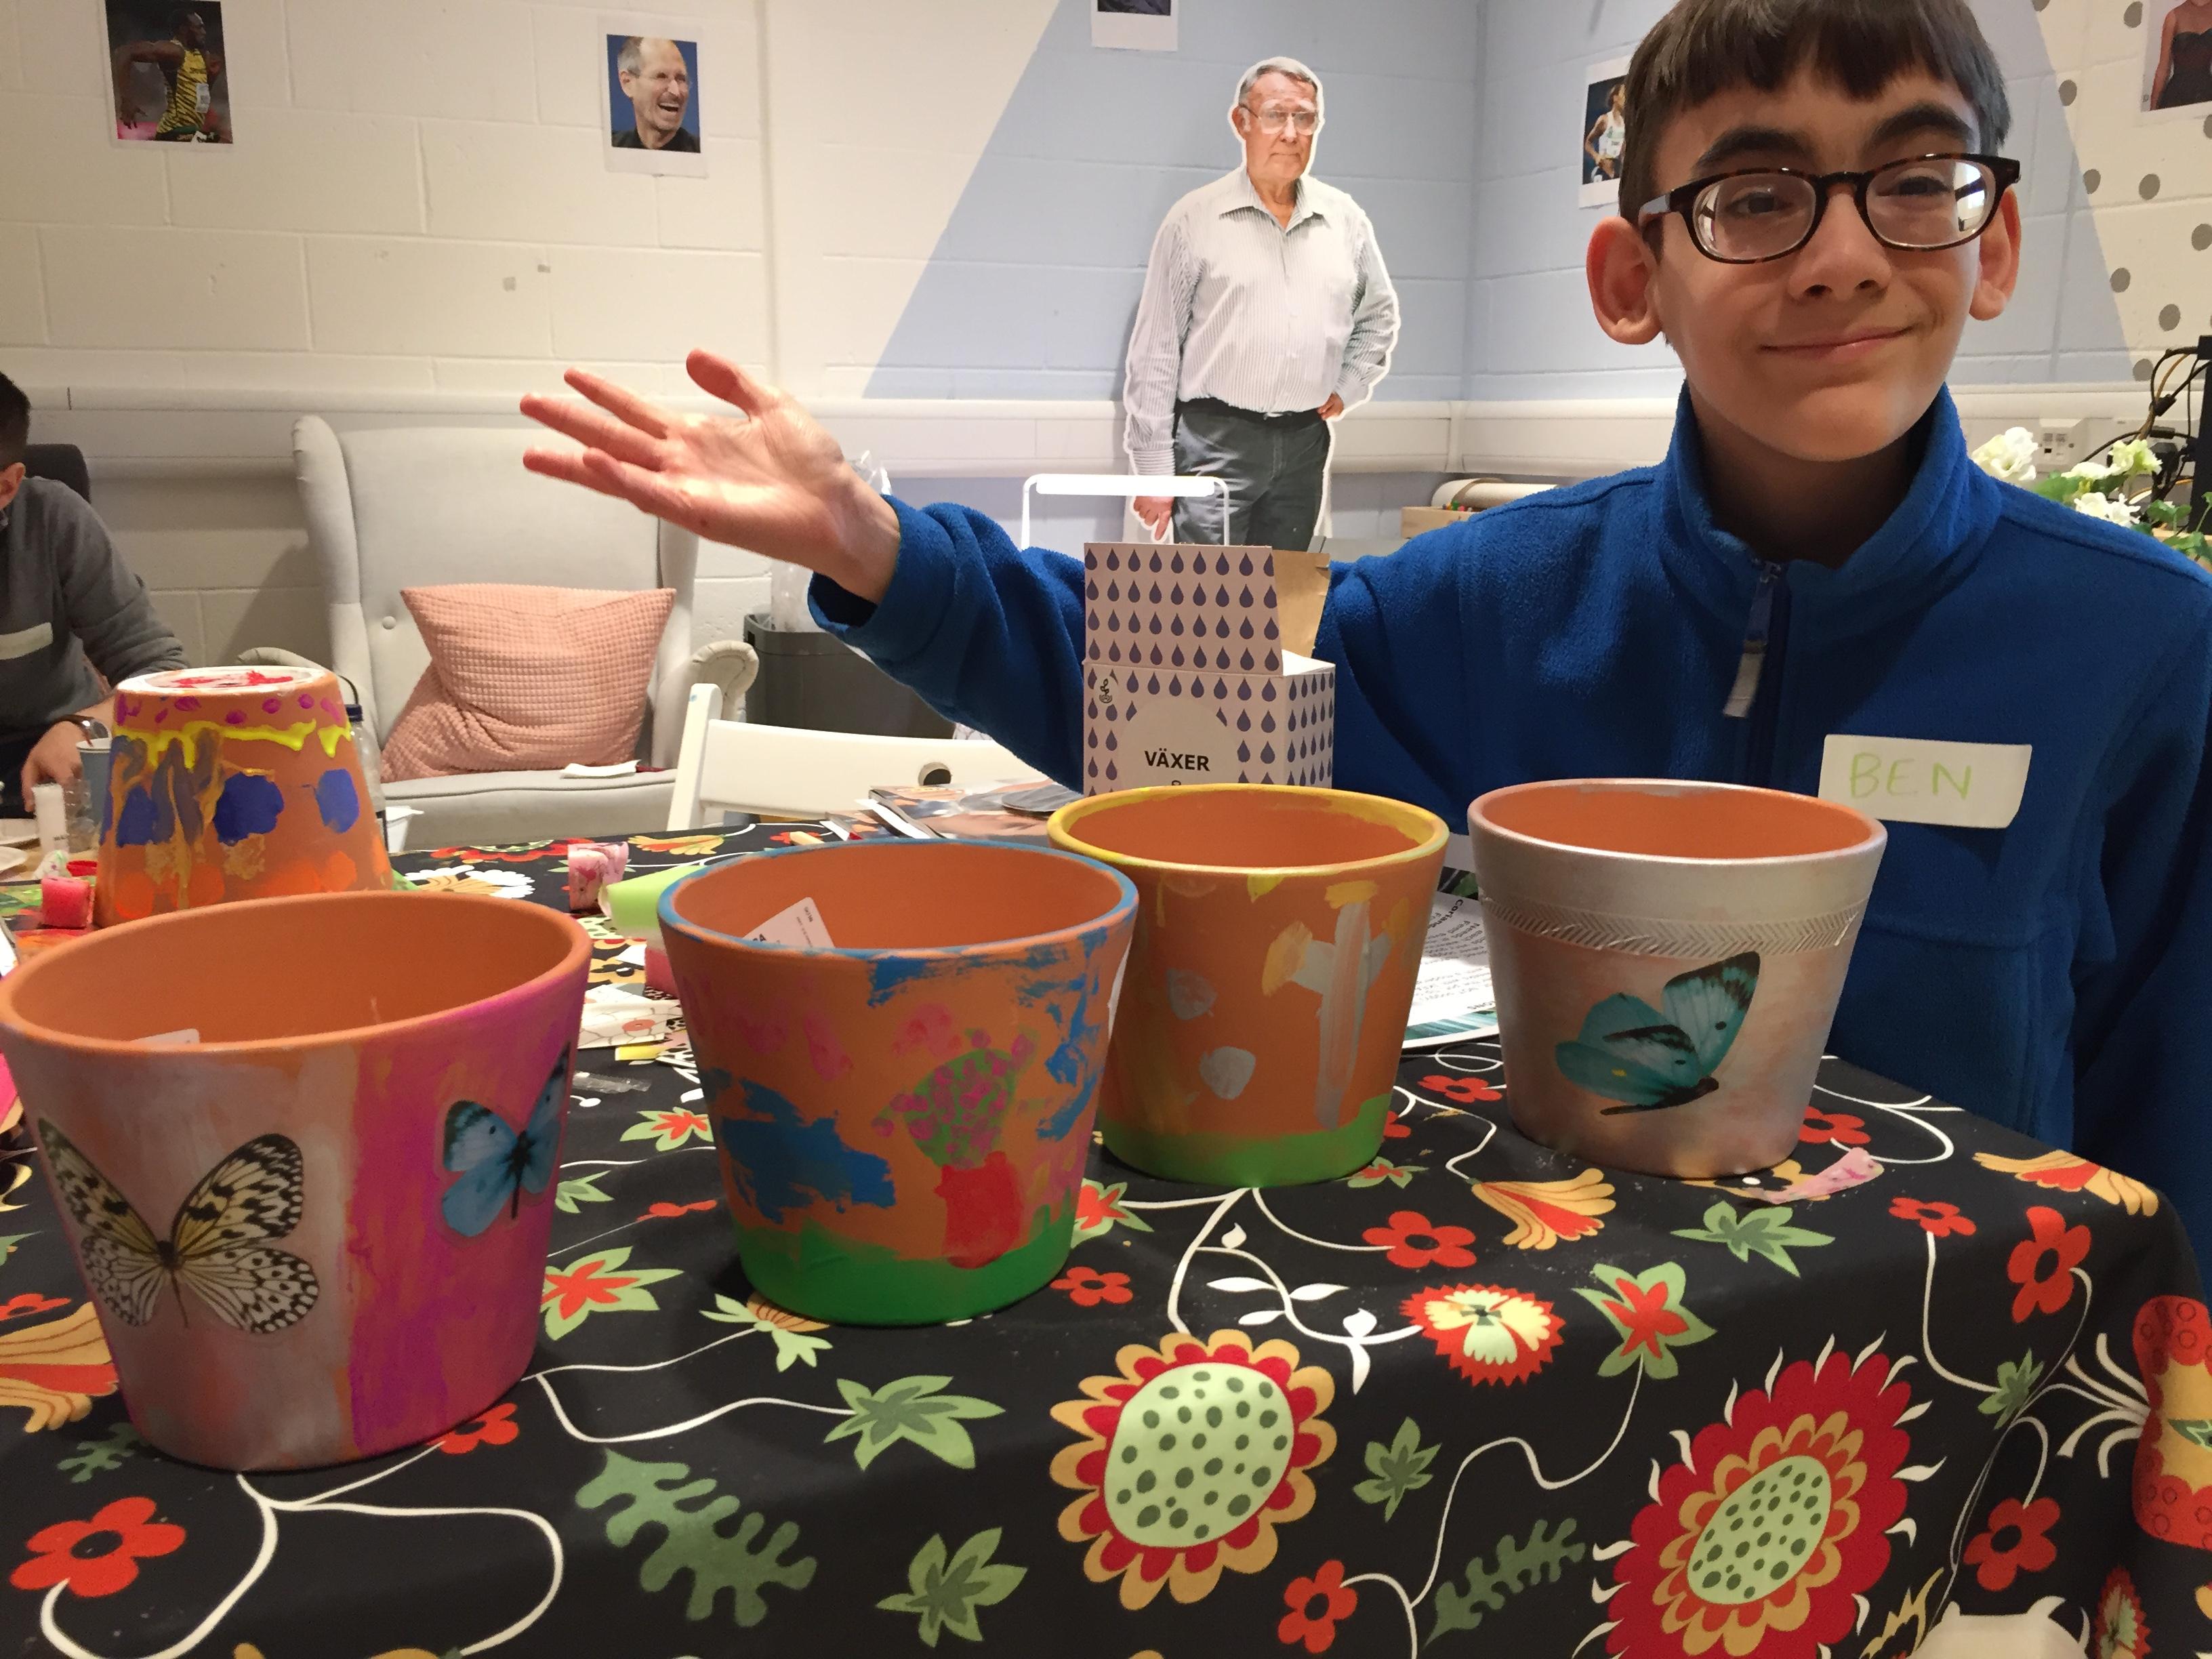 Decorating pots at our LAGOM workshop.